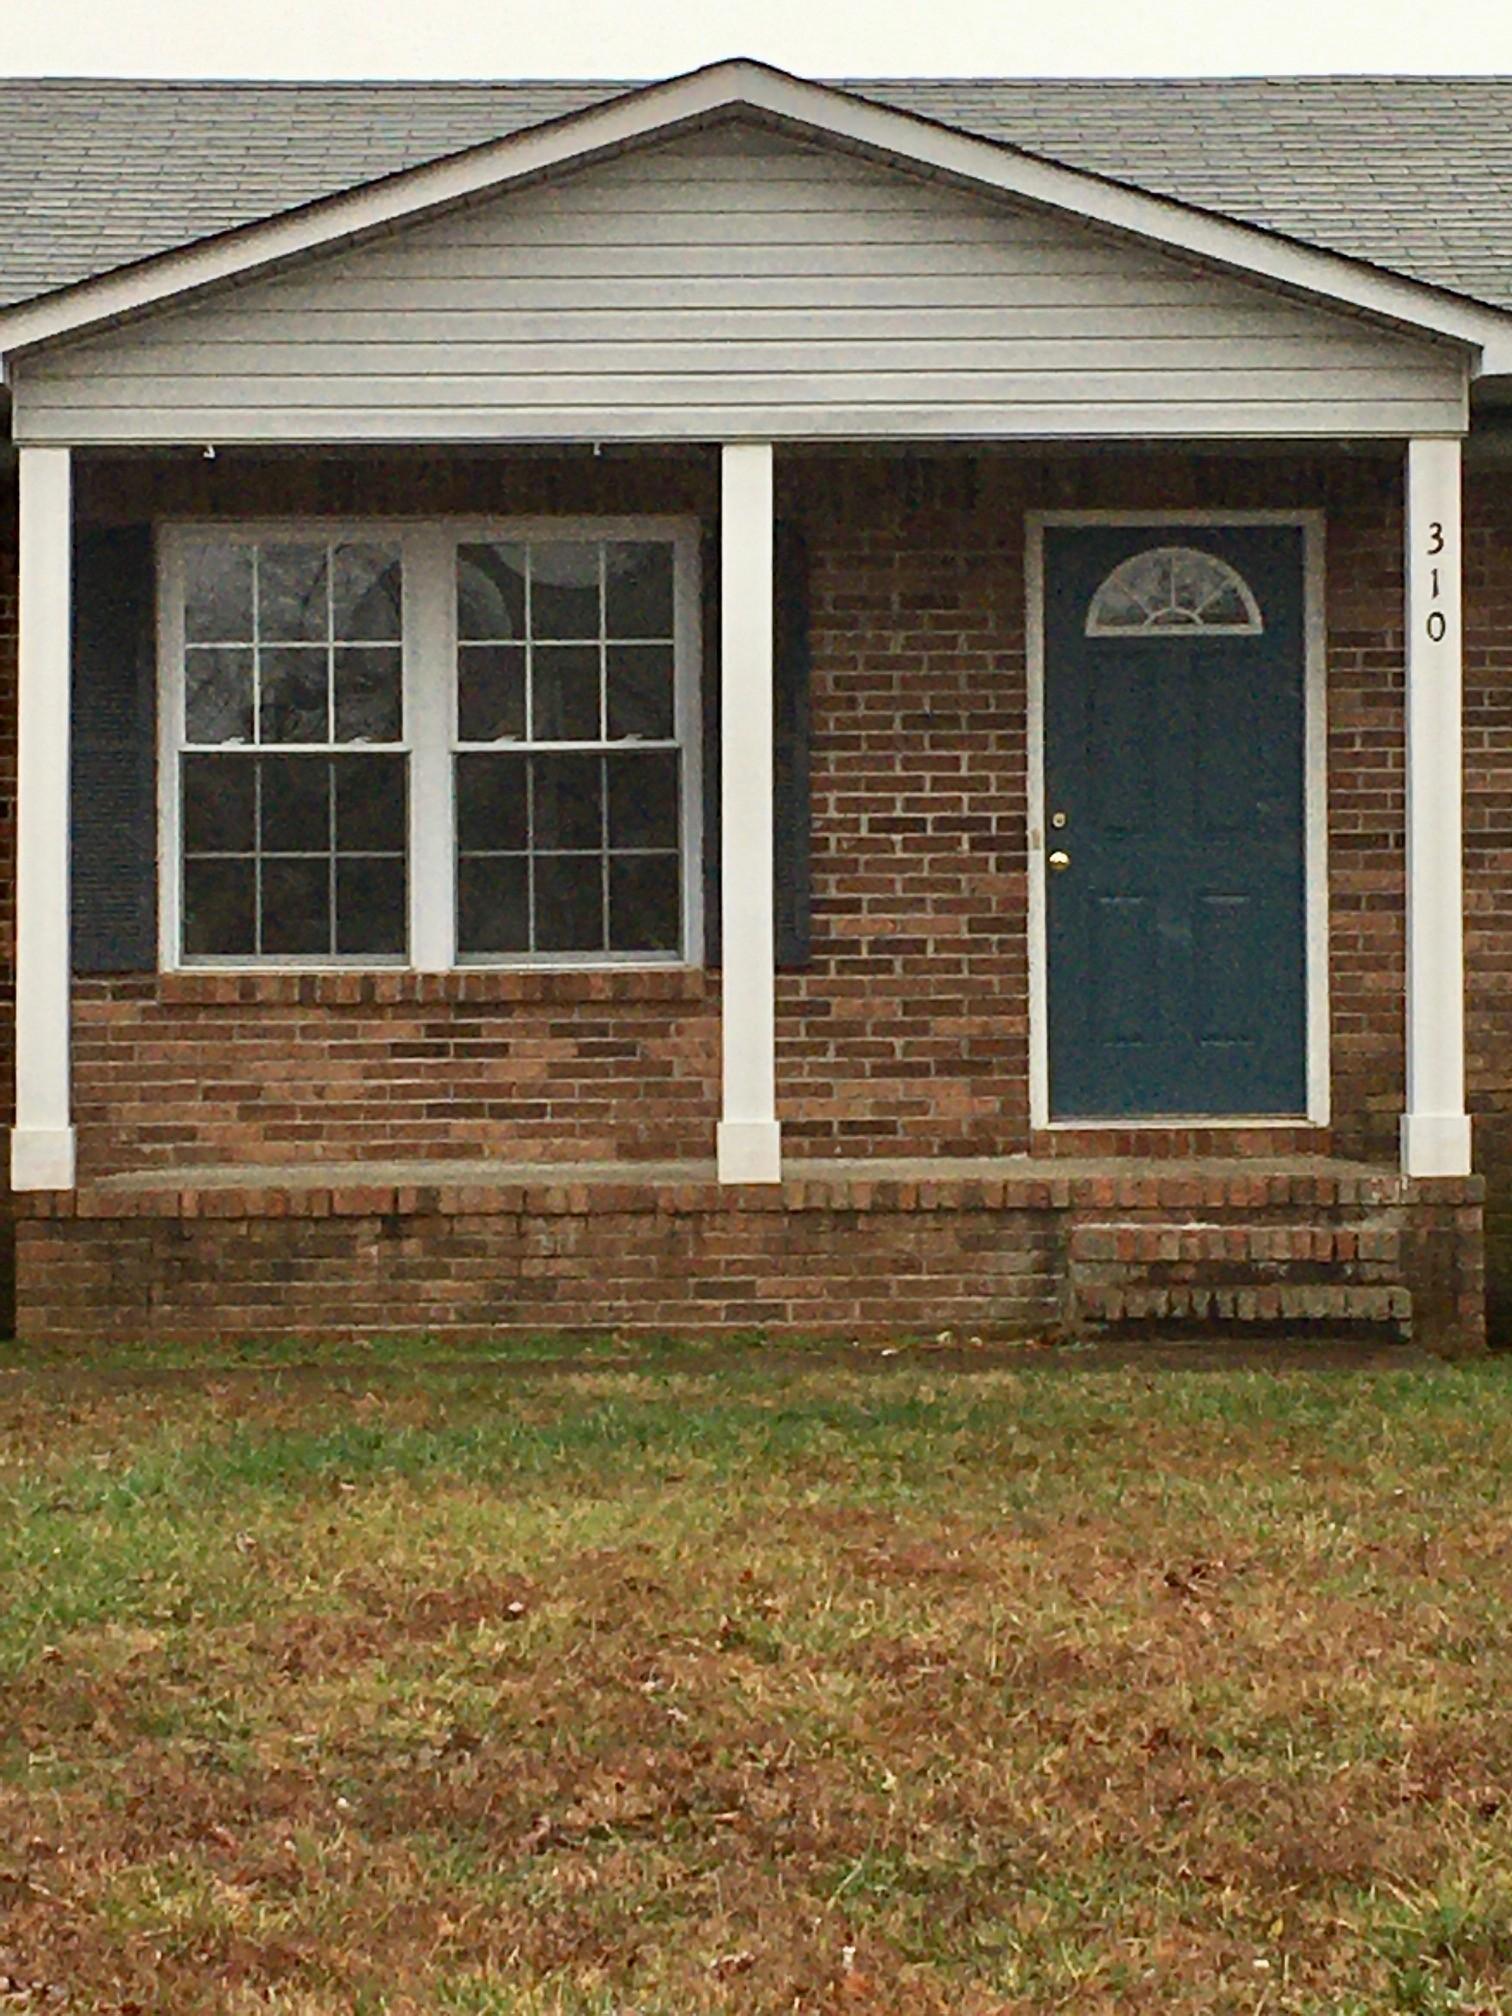 310 Atlantic Ave, Oak Grove, KY 42262 - Oak Grove, KY real estate listing